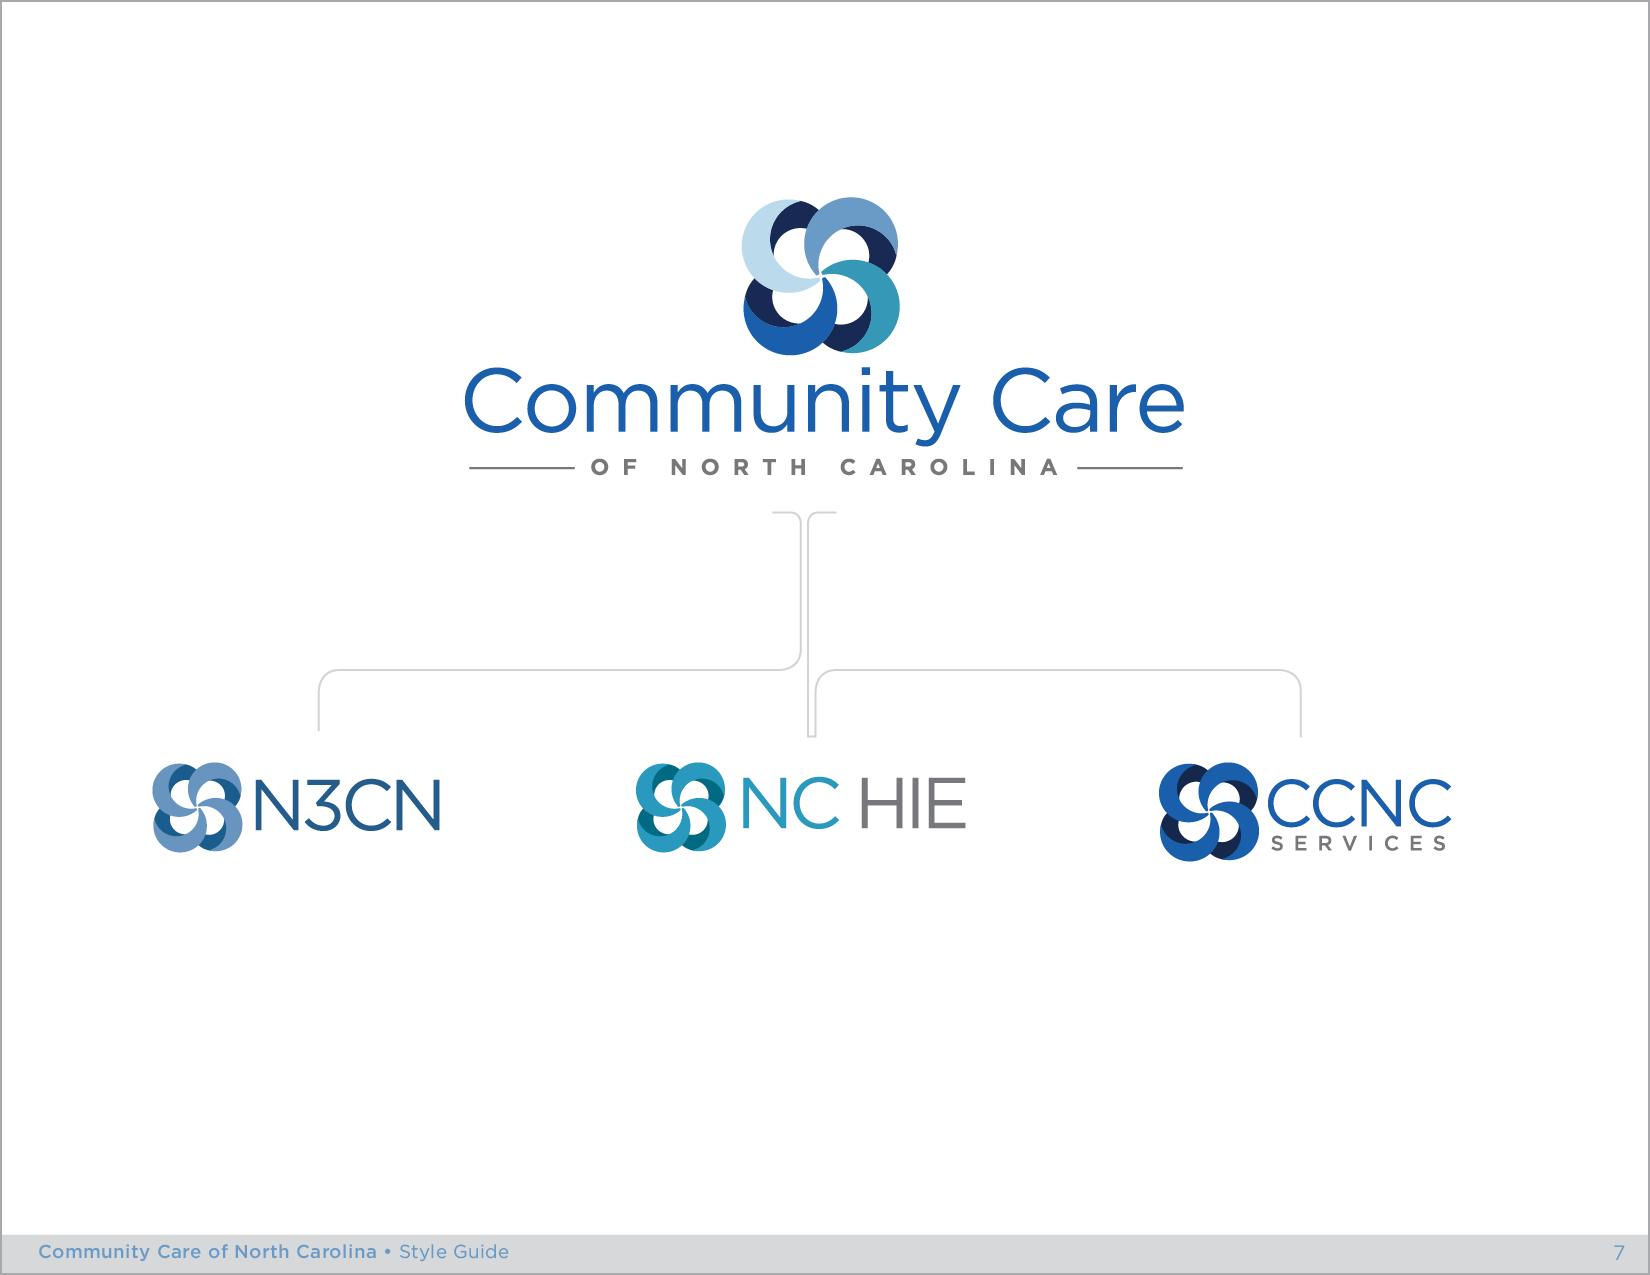 CCNC-Inc-StyleGuide2.png